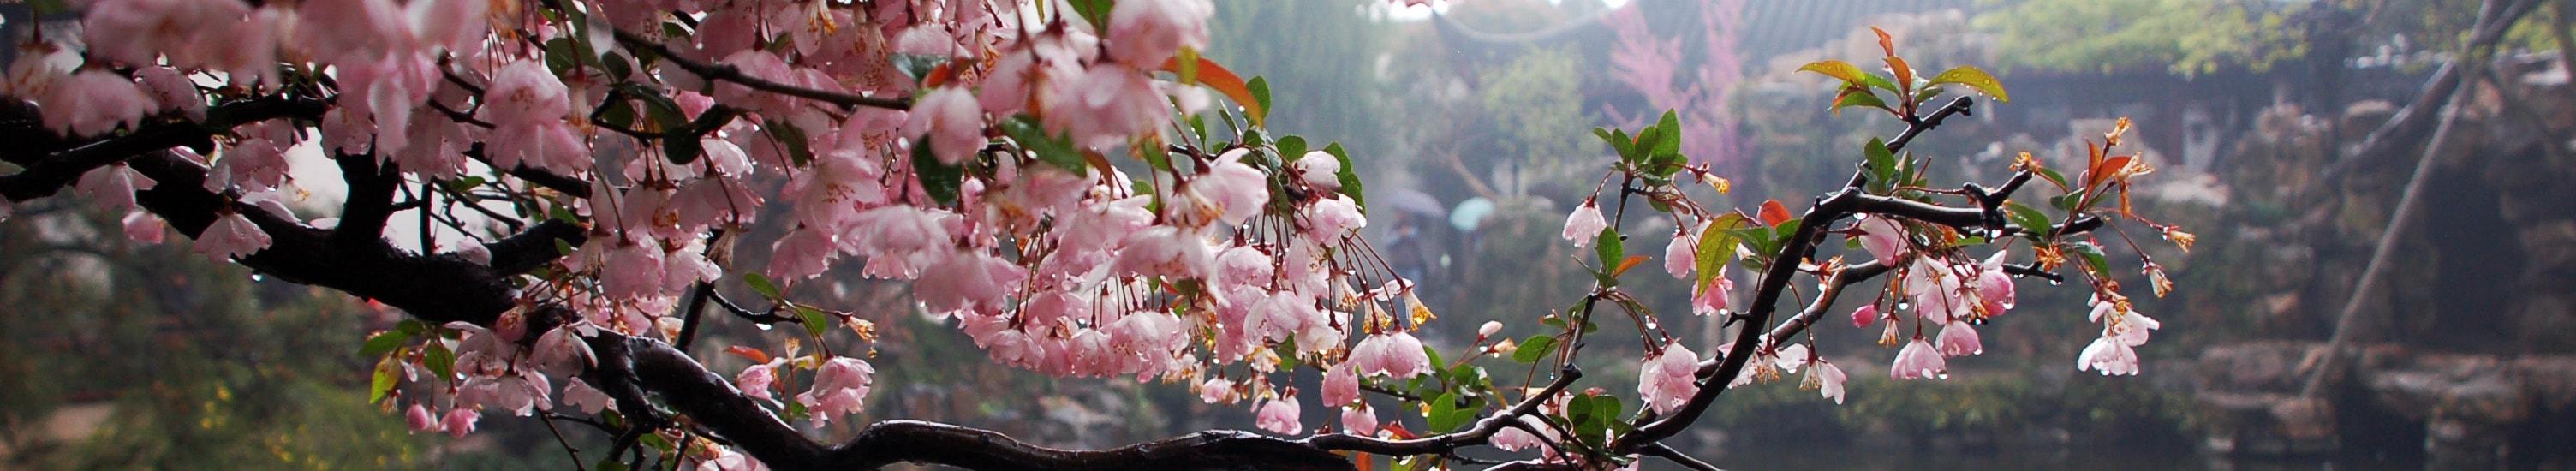 Чудеса южного Китая <br> Гонконг — Макао — Гуанчжоу — Гуйлинь — Яншо — Шэньчжэнь — Гонконг